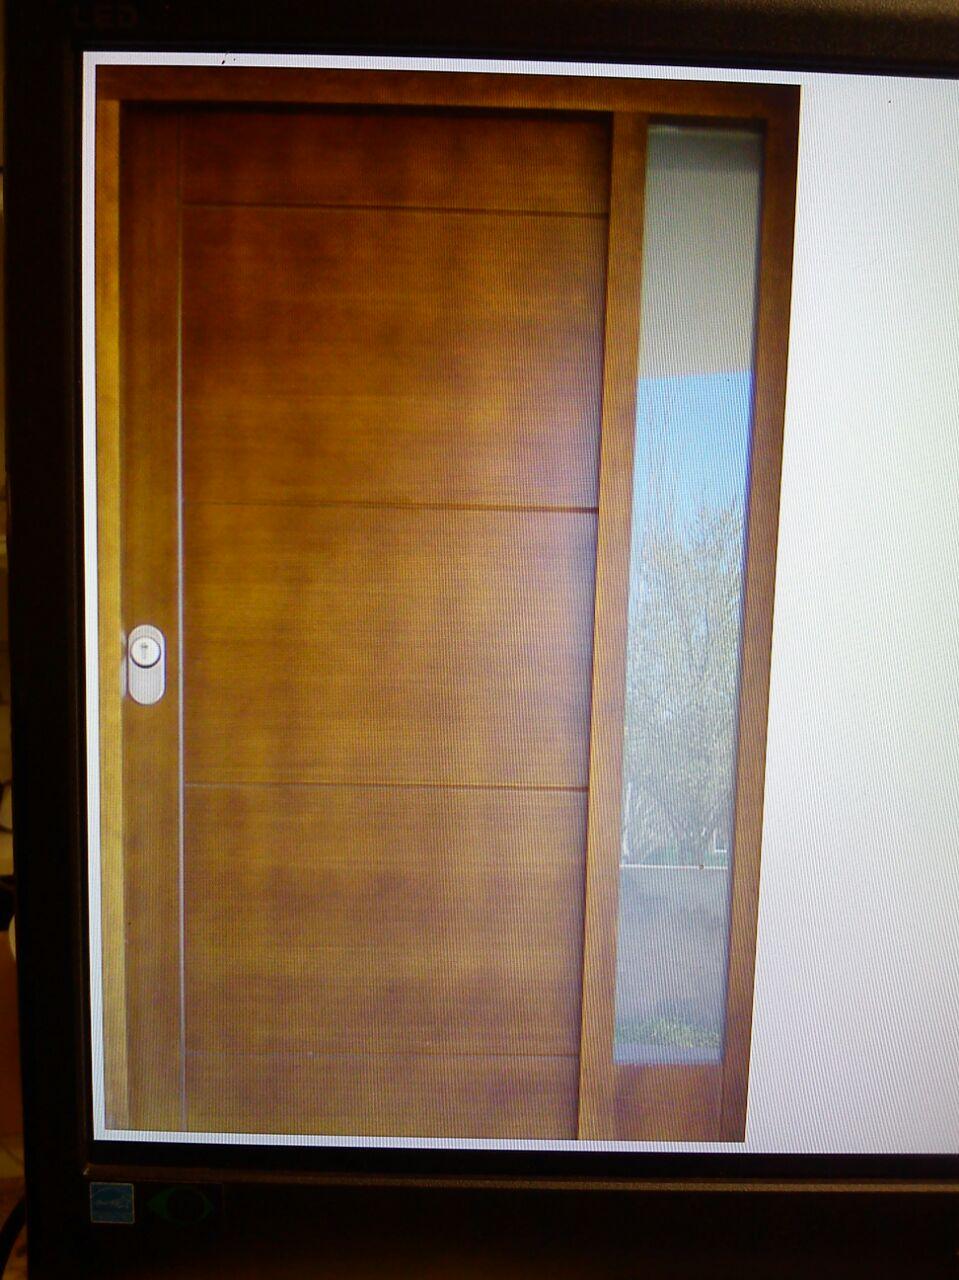 Ventanas de aluminio zaragoza ventanas de pvc zaragoza - Cambiar ventanas precio ...